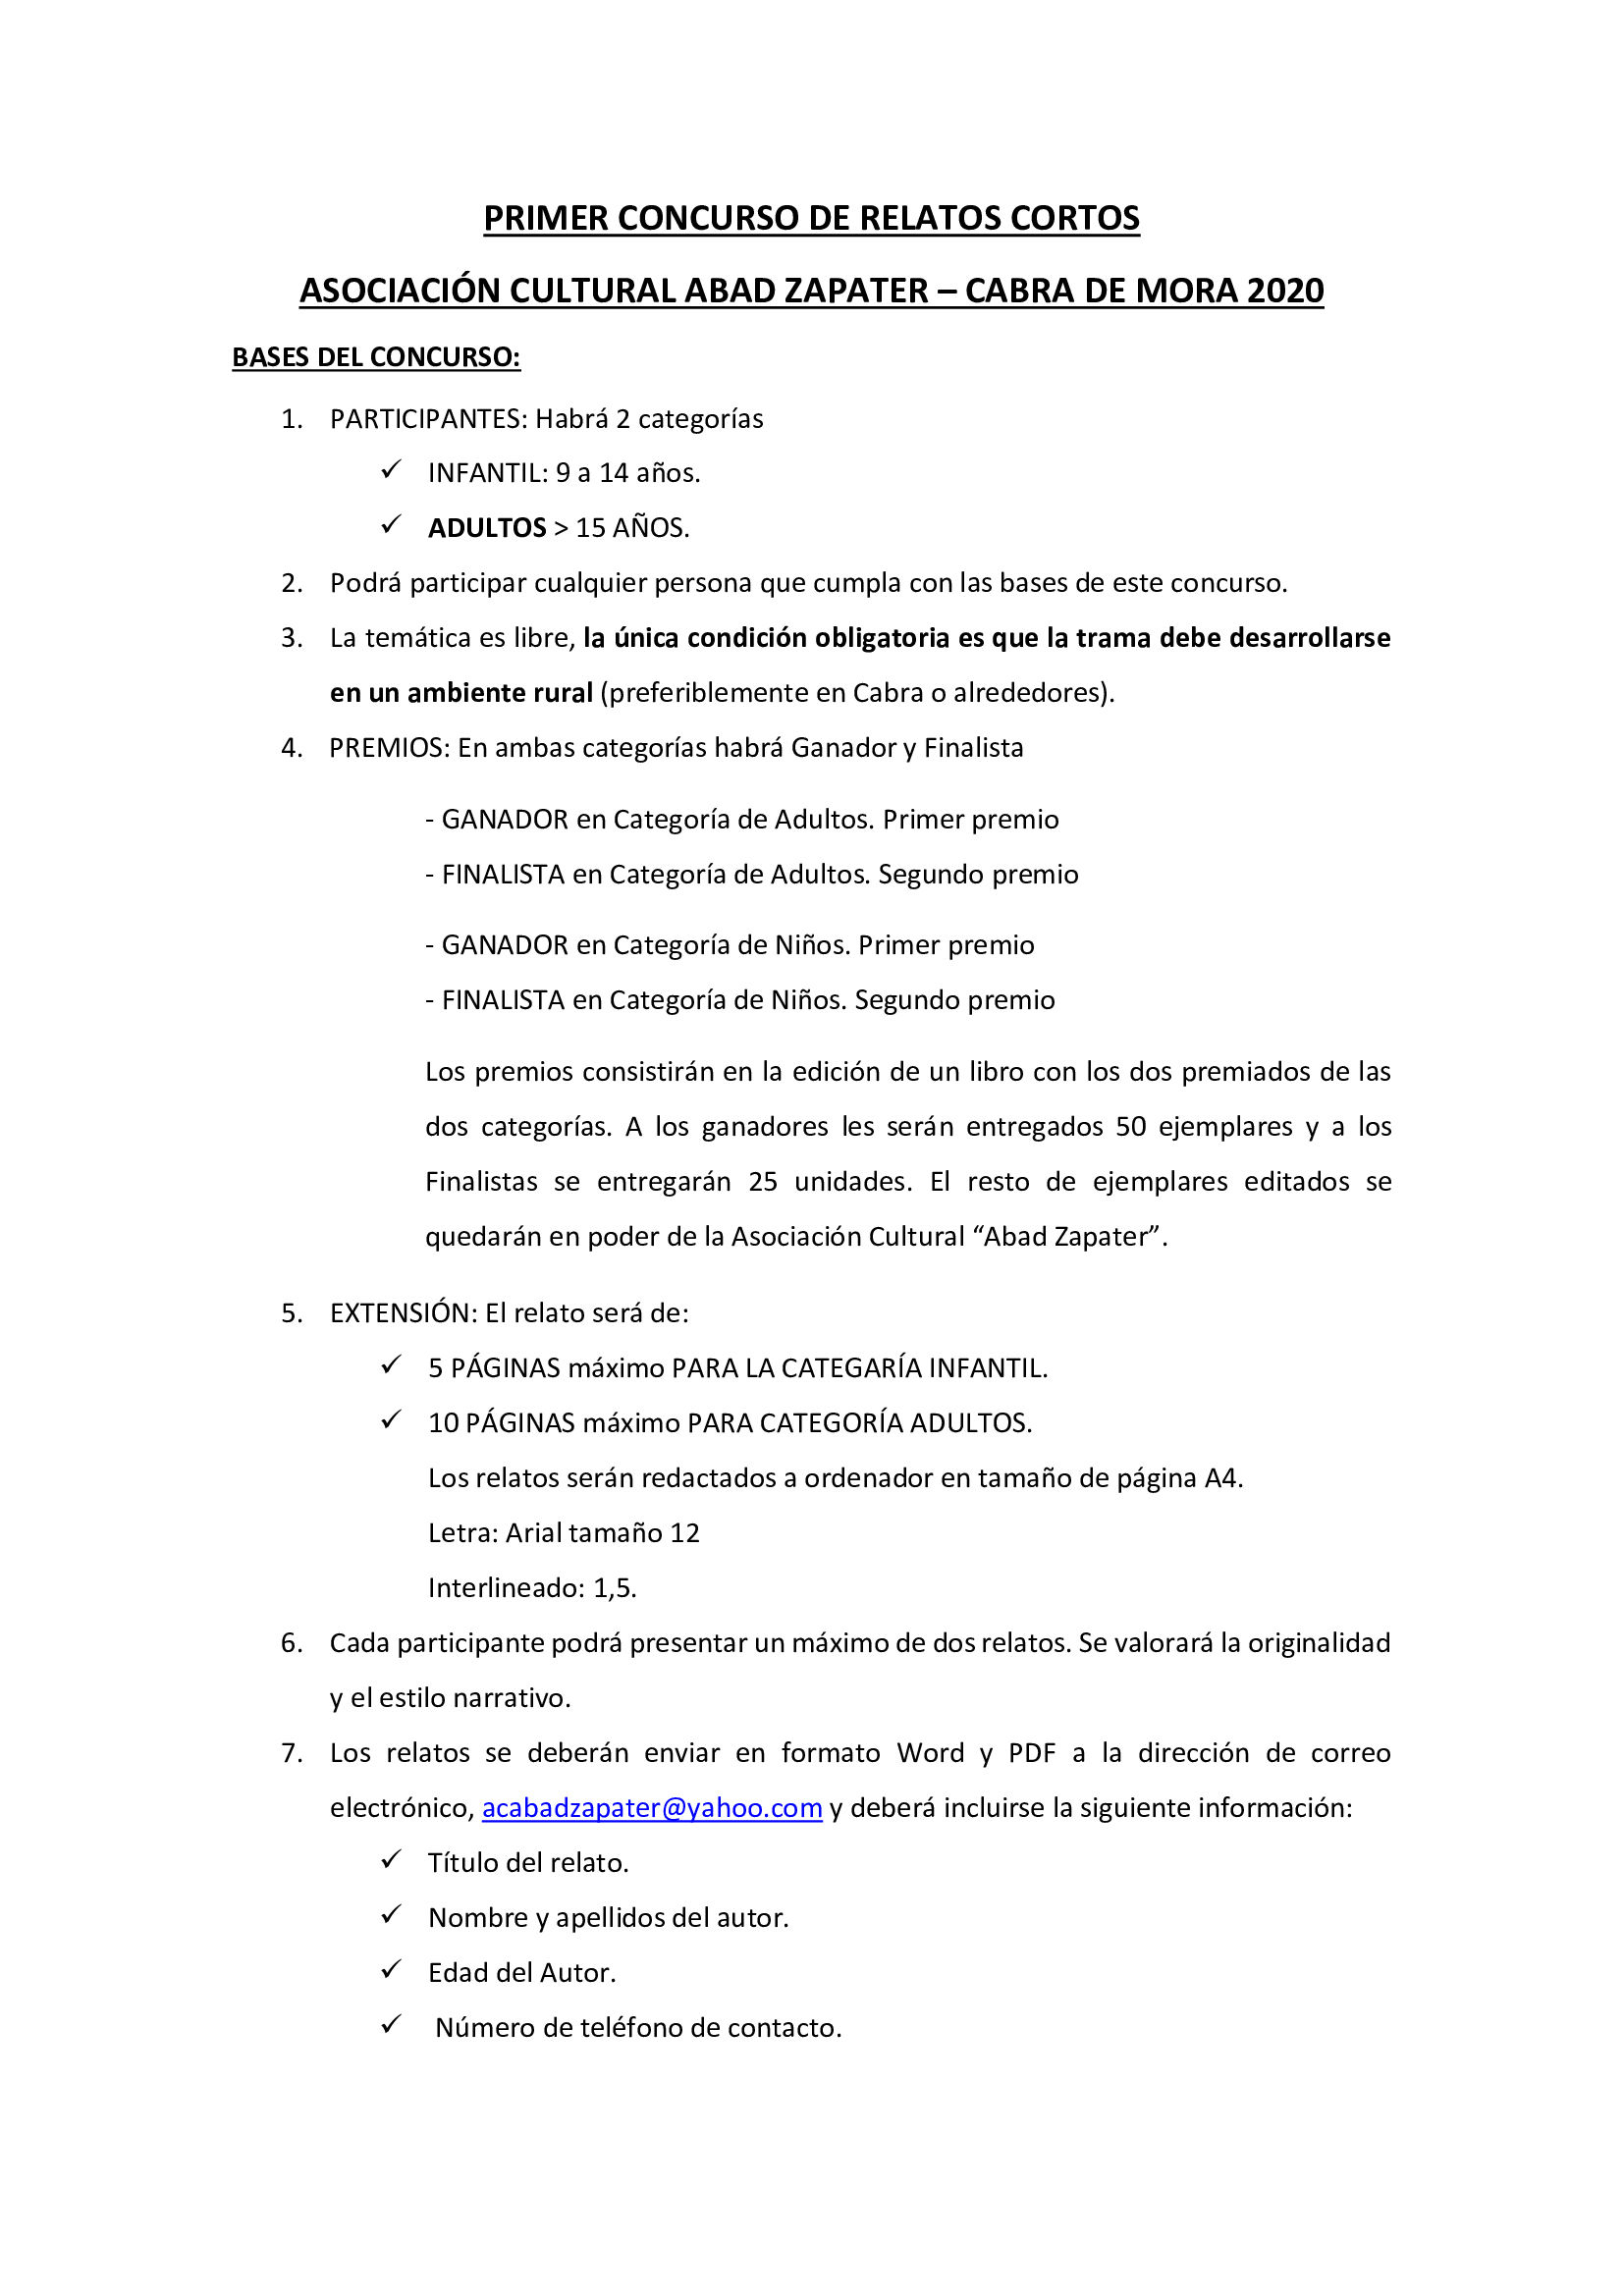 BASES PRIMER CONCURSO DE RELATOS CORTOS CABRA DE MORA 2020 1